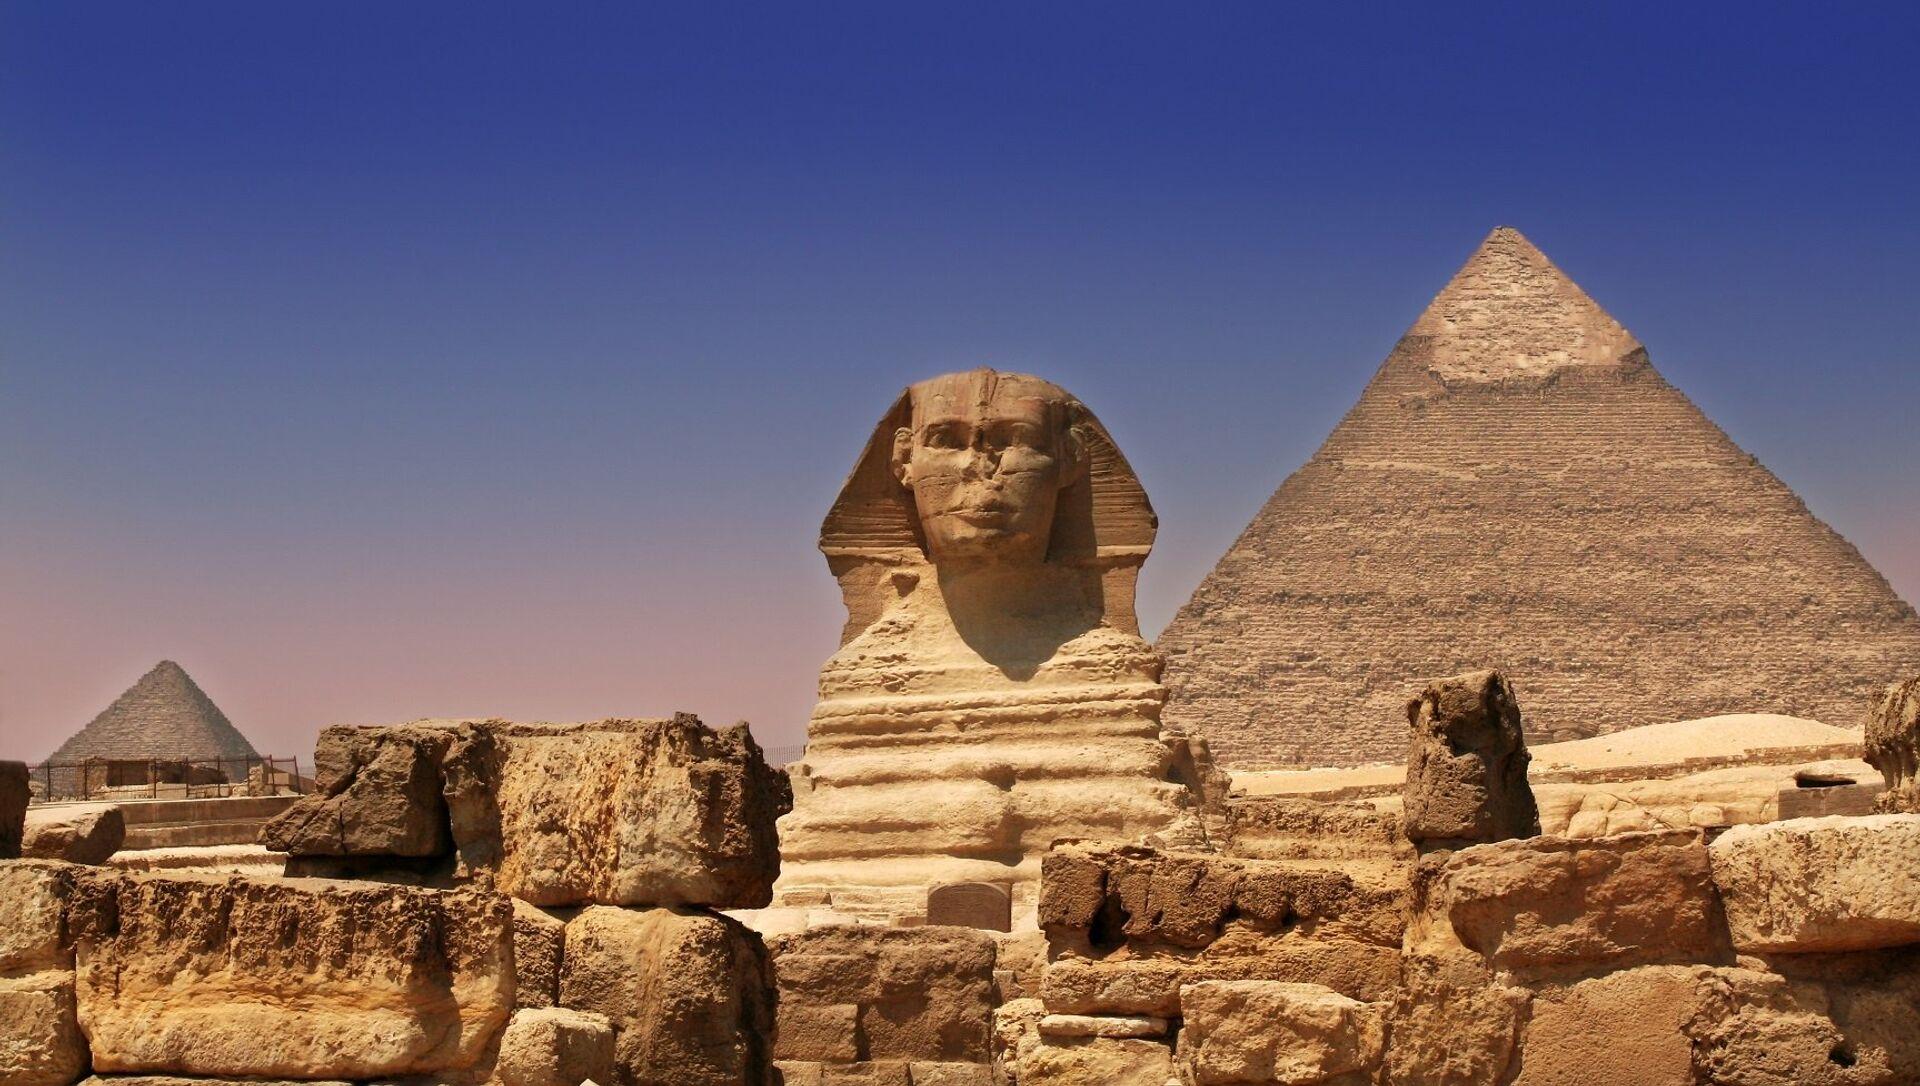 Giza Pyramids & Sphinx - Egypt - Sputnik Italia, 1920, 04.02.2021